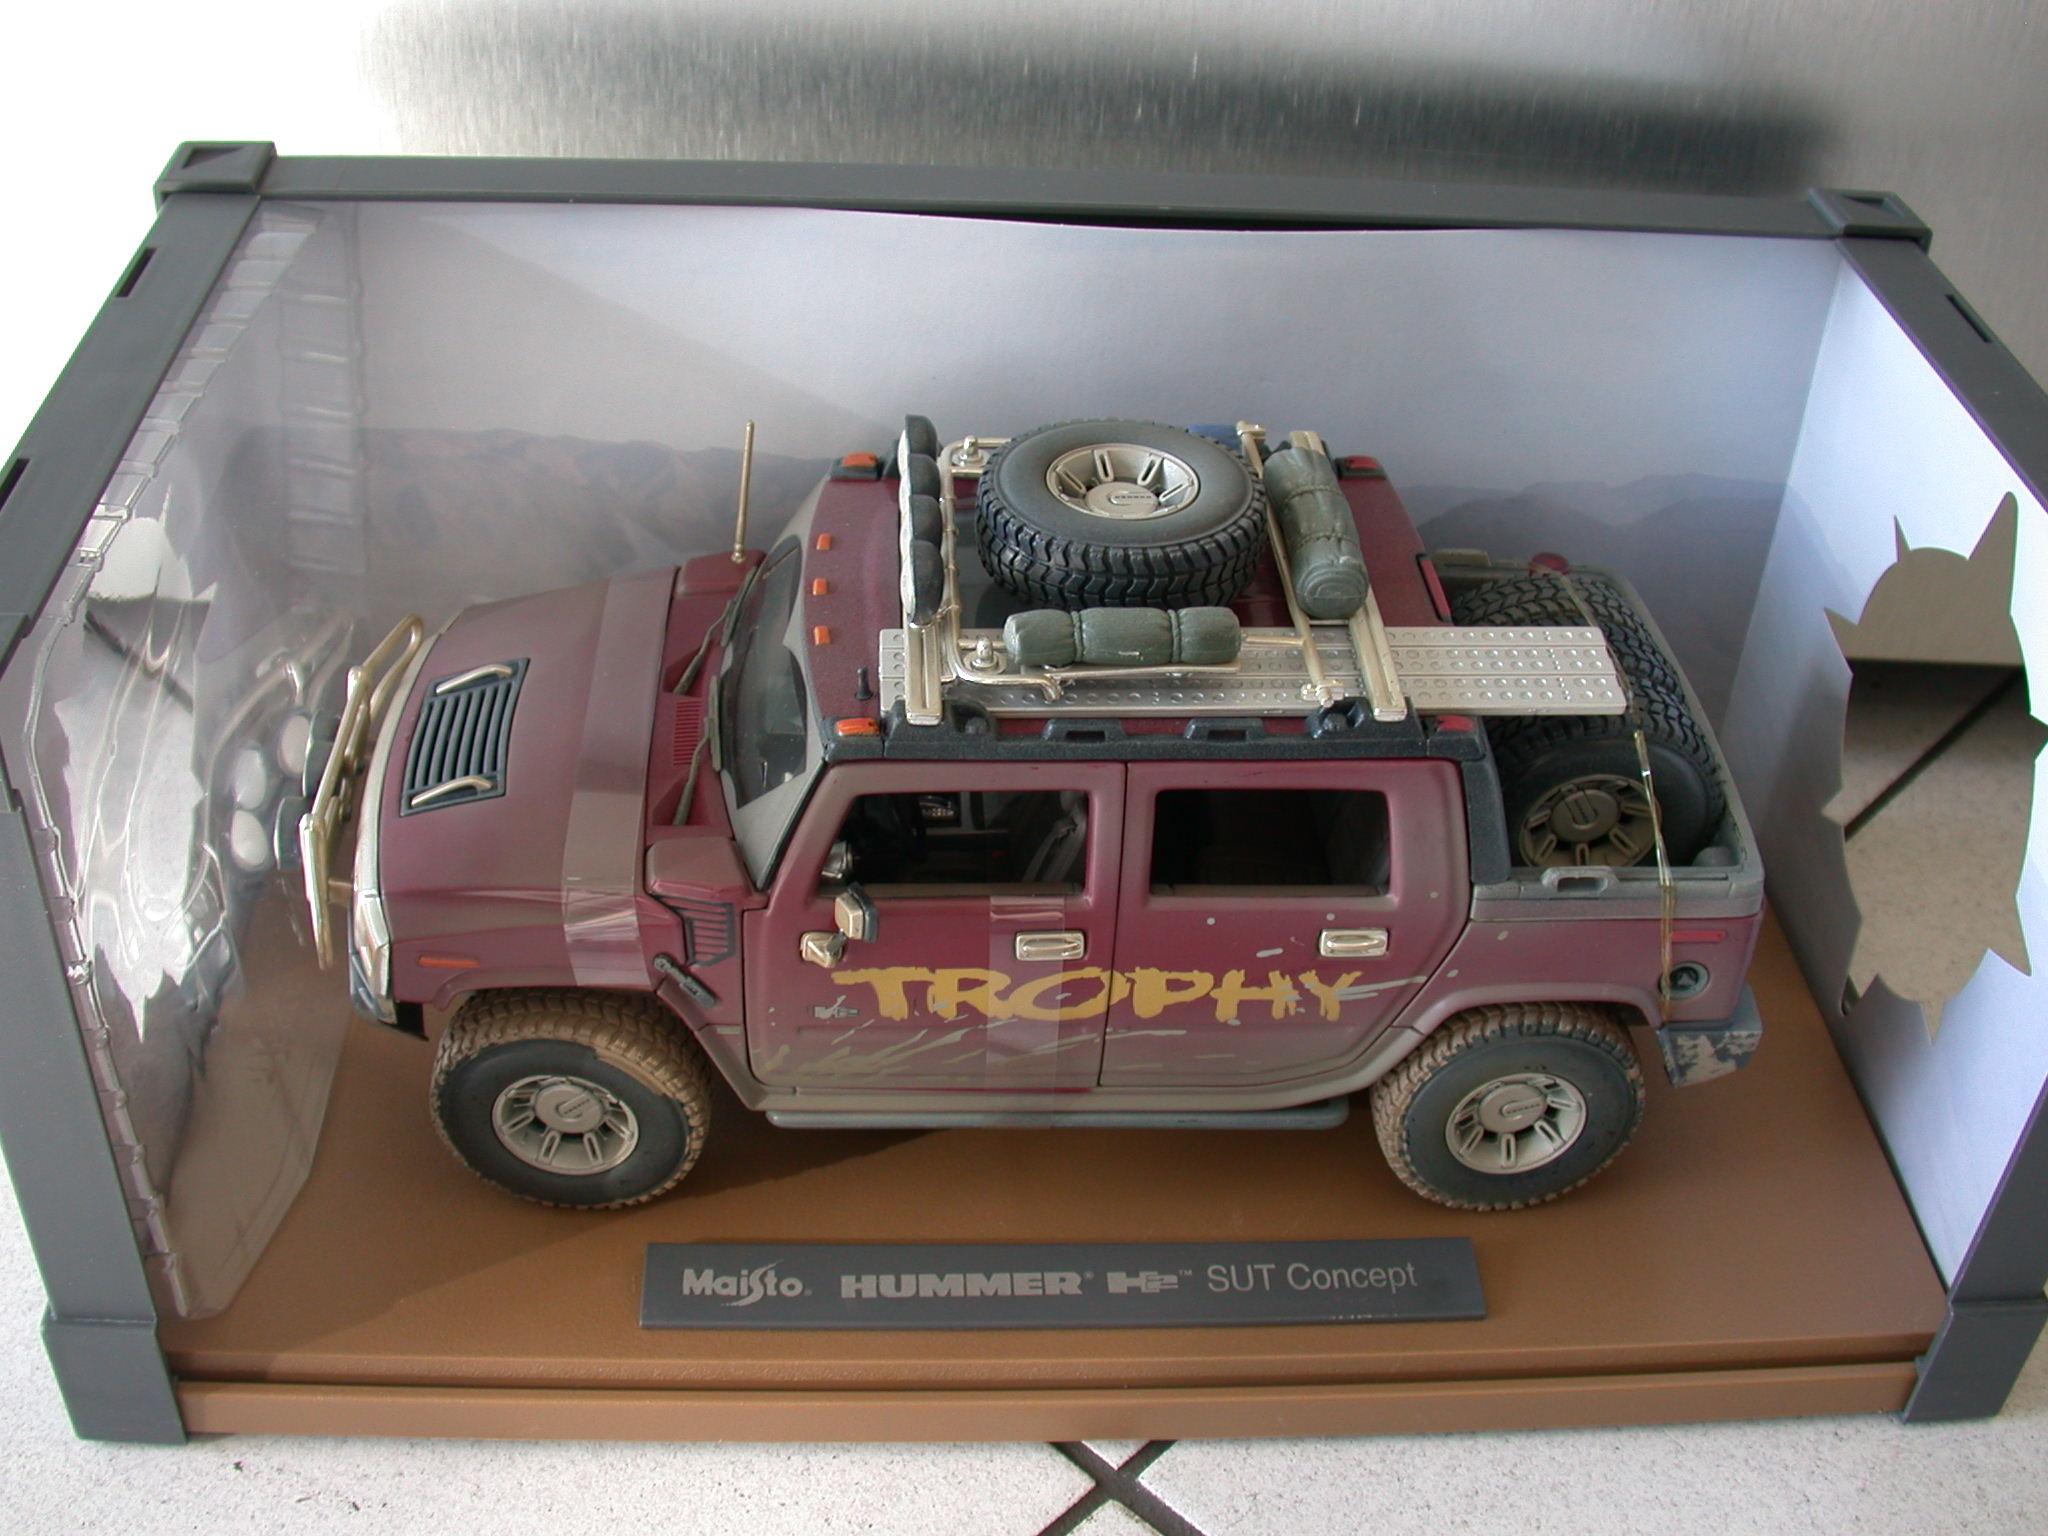 1:18 H2 SUT Modell Dirt Rider